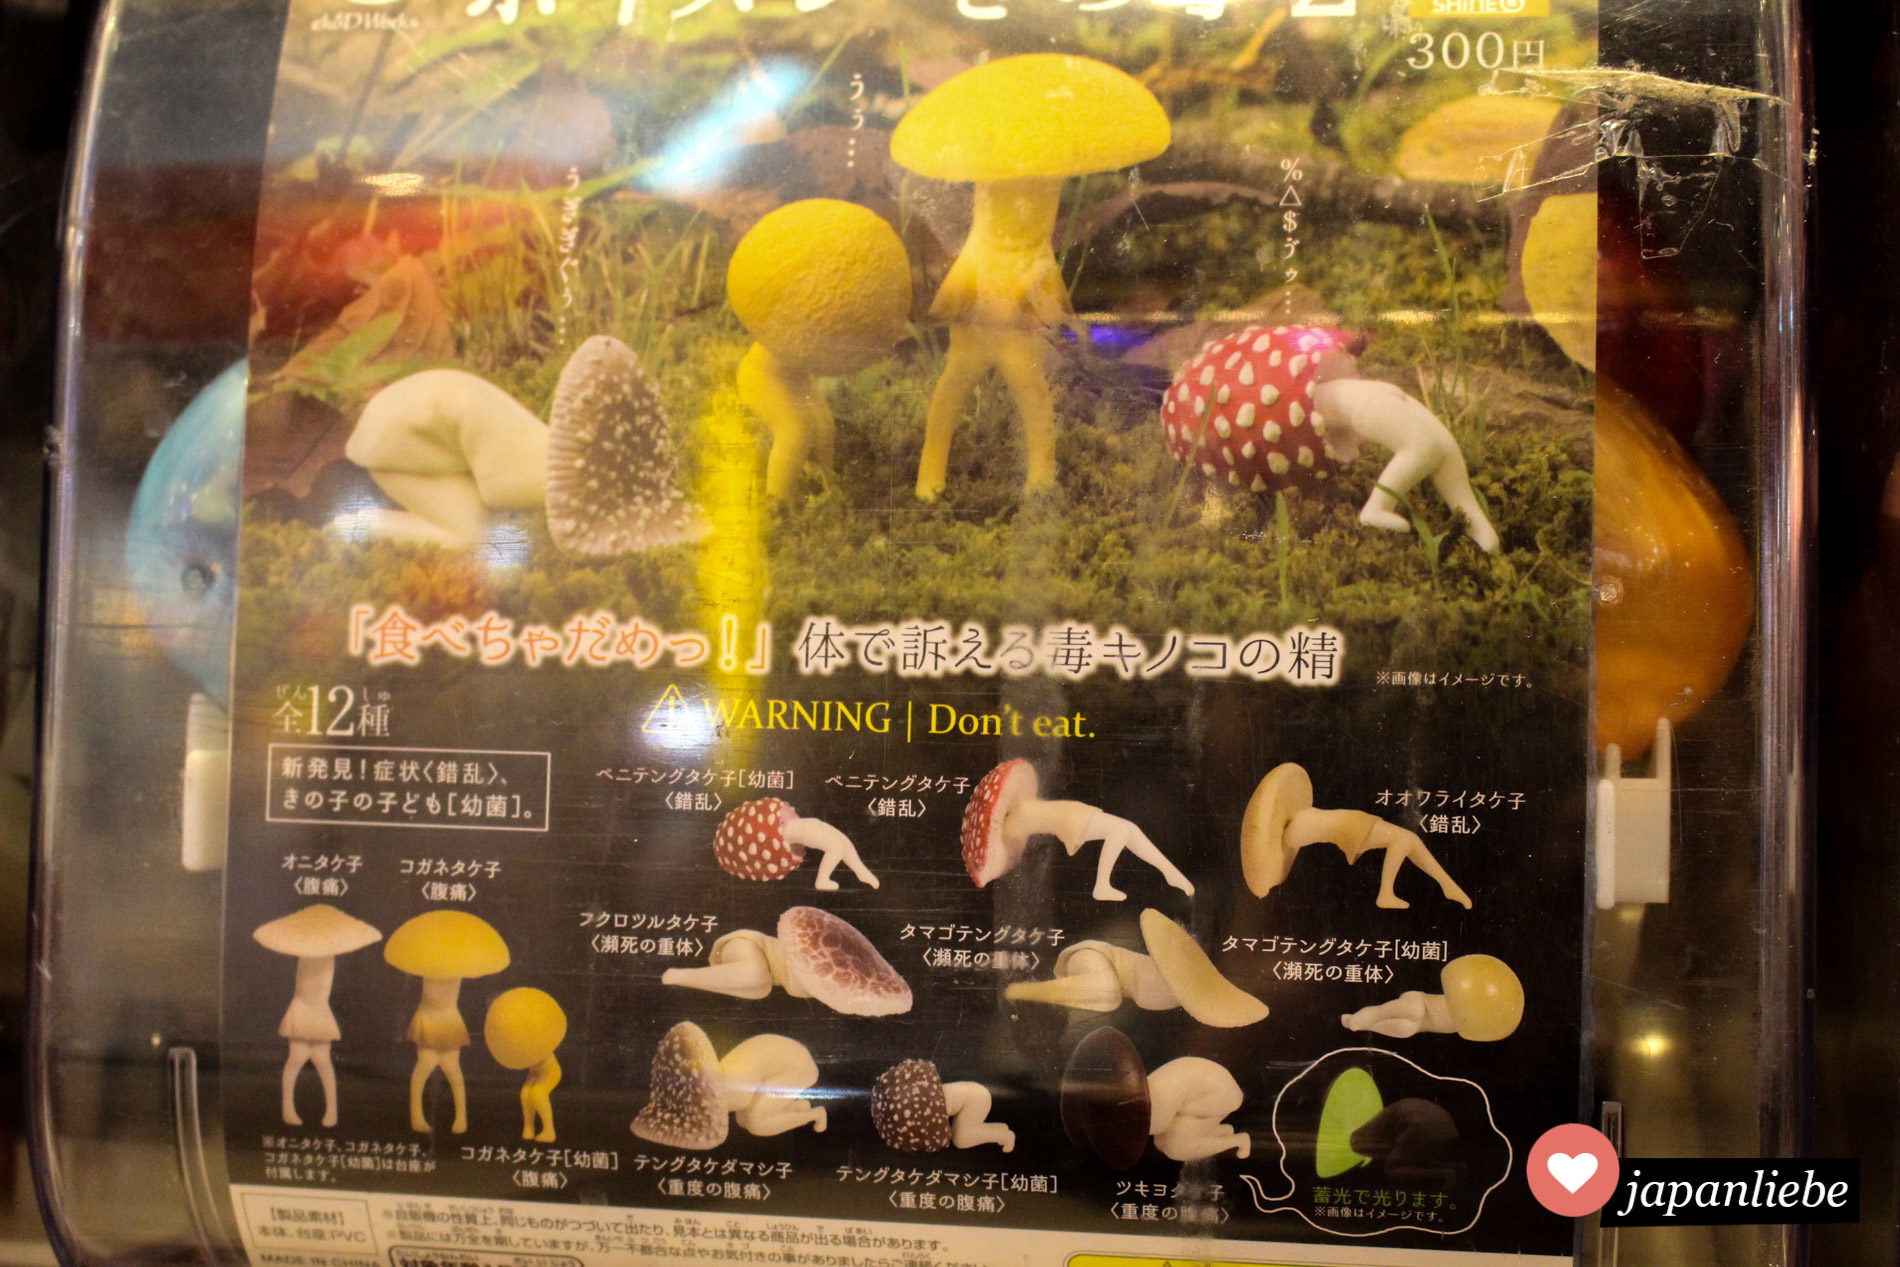 Gashapon: Pilze mit Körper